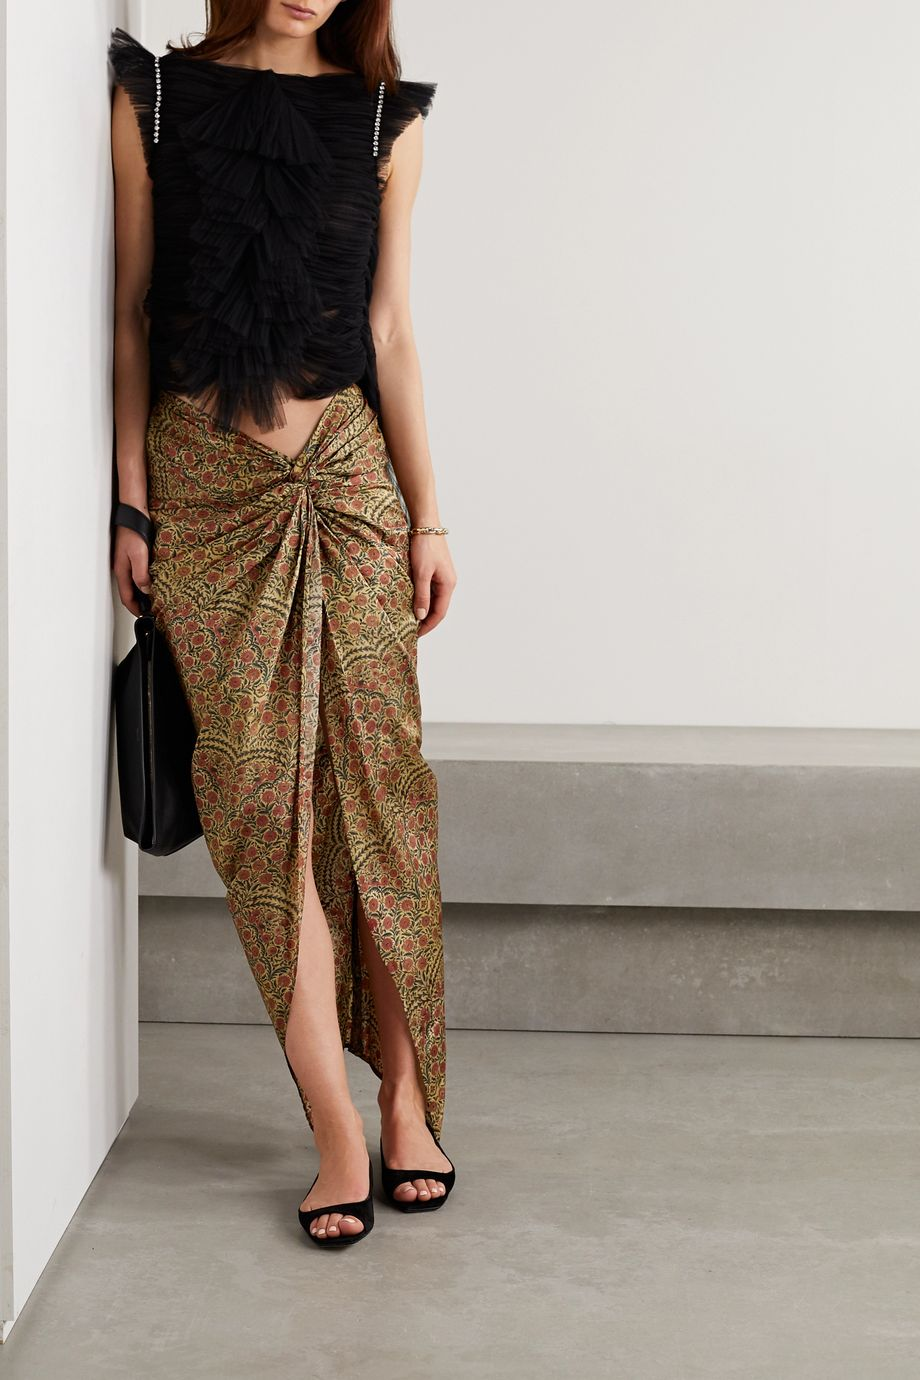 Khaite Louie 垂坠花卉印花斜纹布中长半身裙